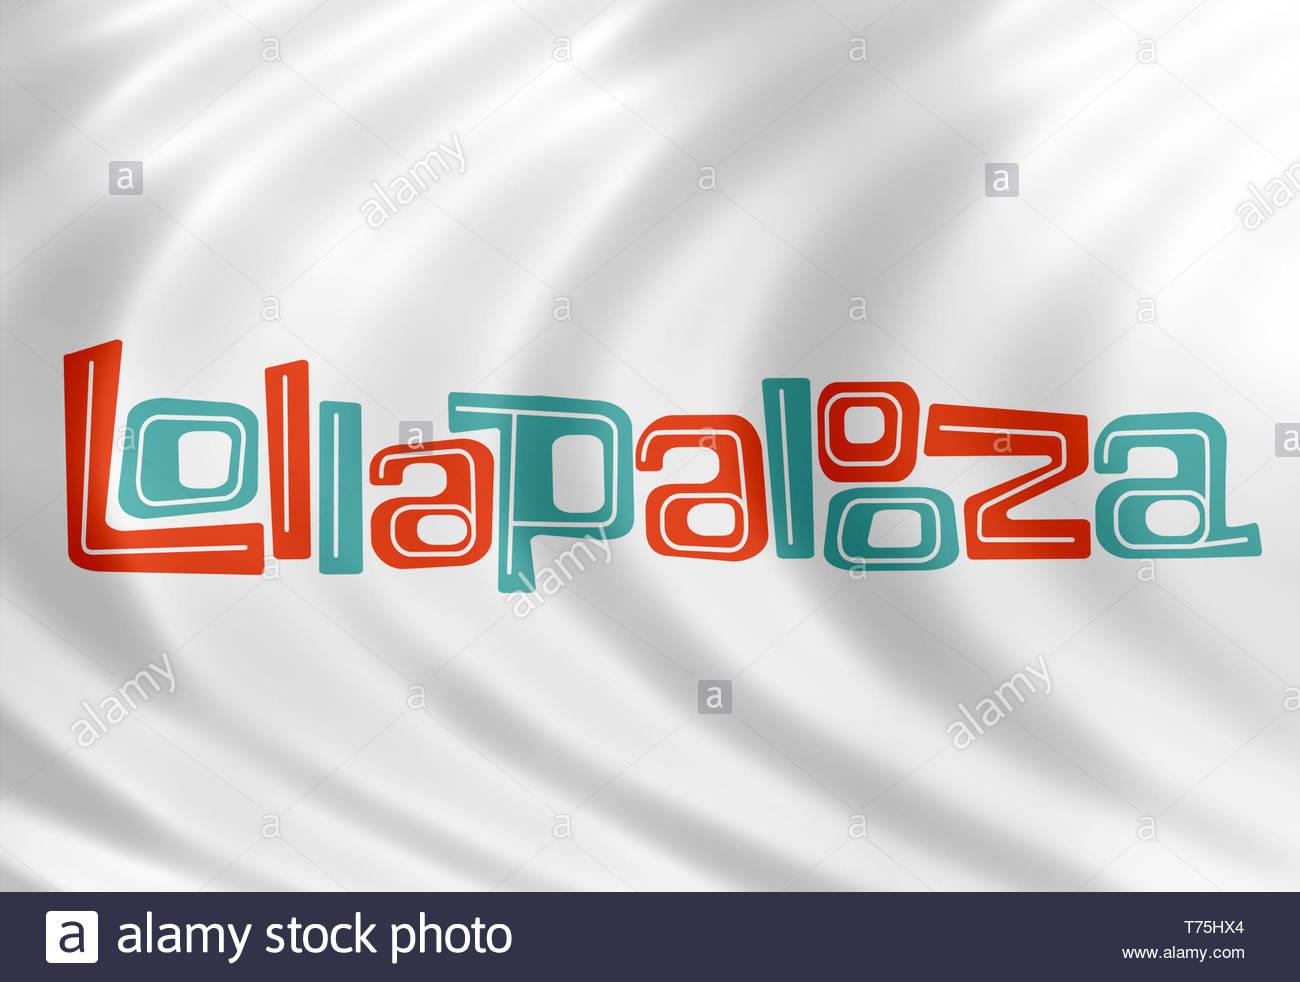 Lollapalooza music festival flag sign - Stock Image